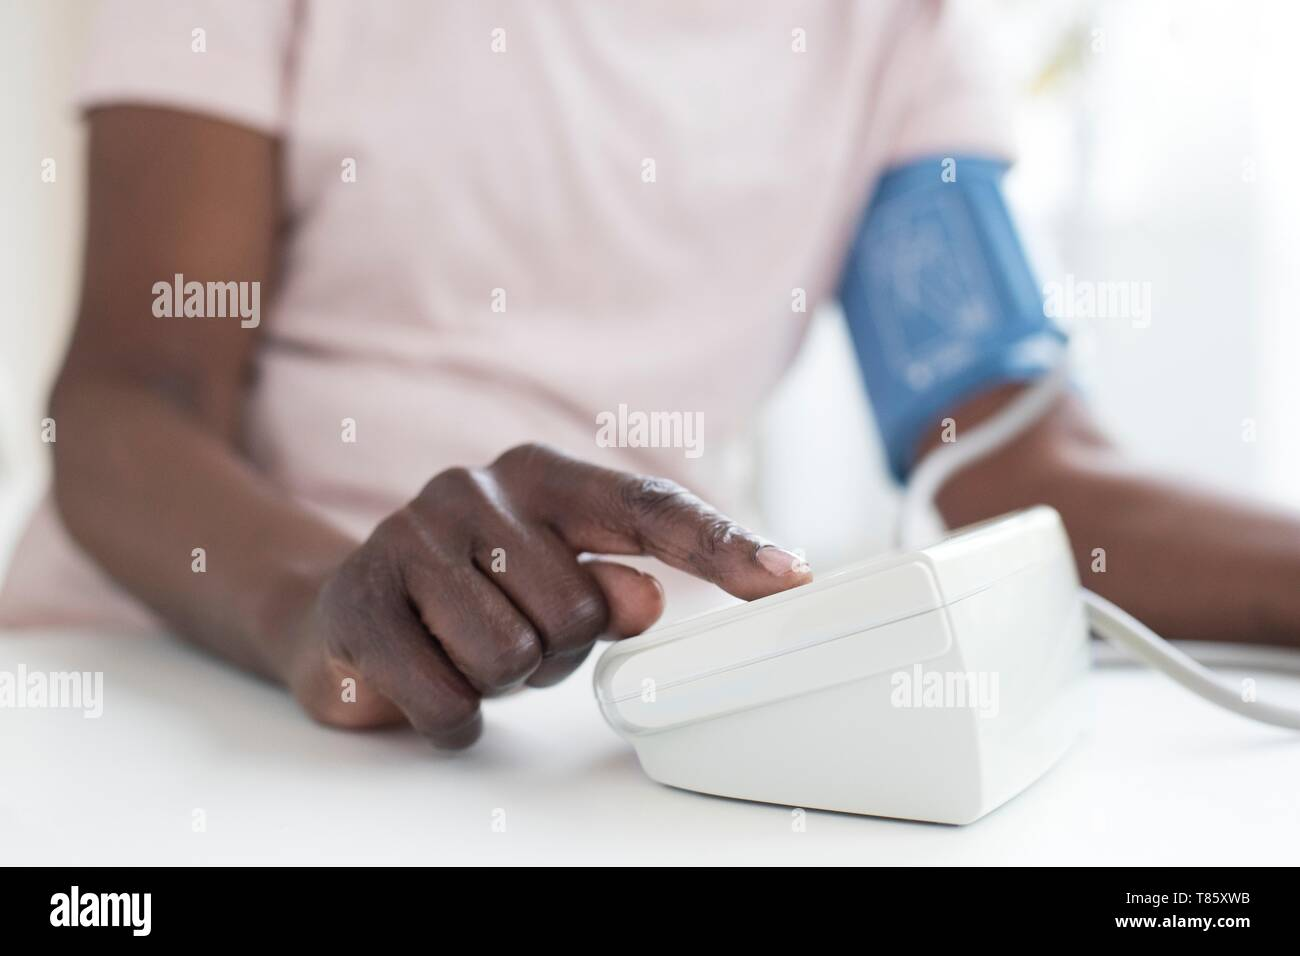 Woman testing blood pressure - Stock Image